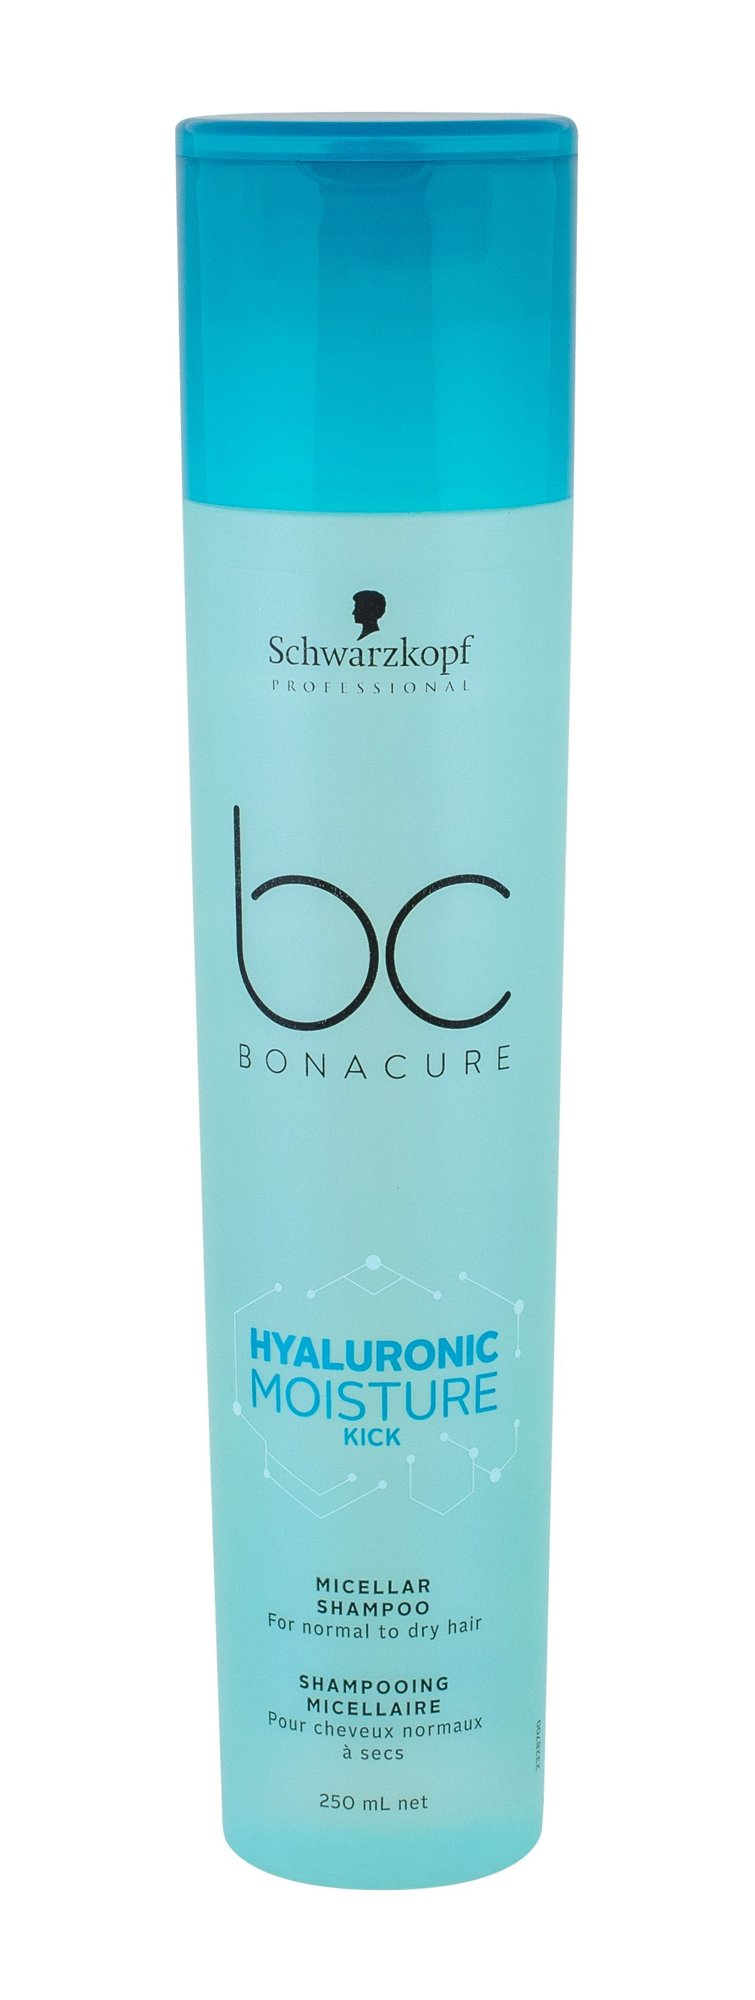 Schwarzkopf BC Bonacure Hyaluronic Moisture Kick Shampoo 250ml